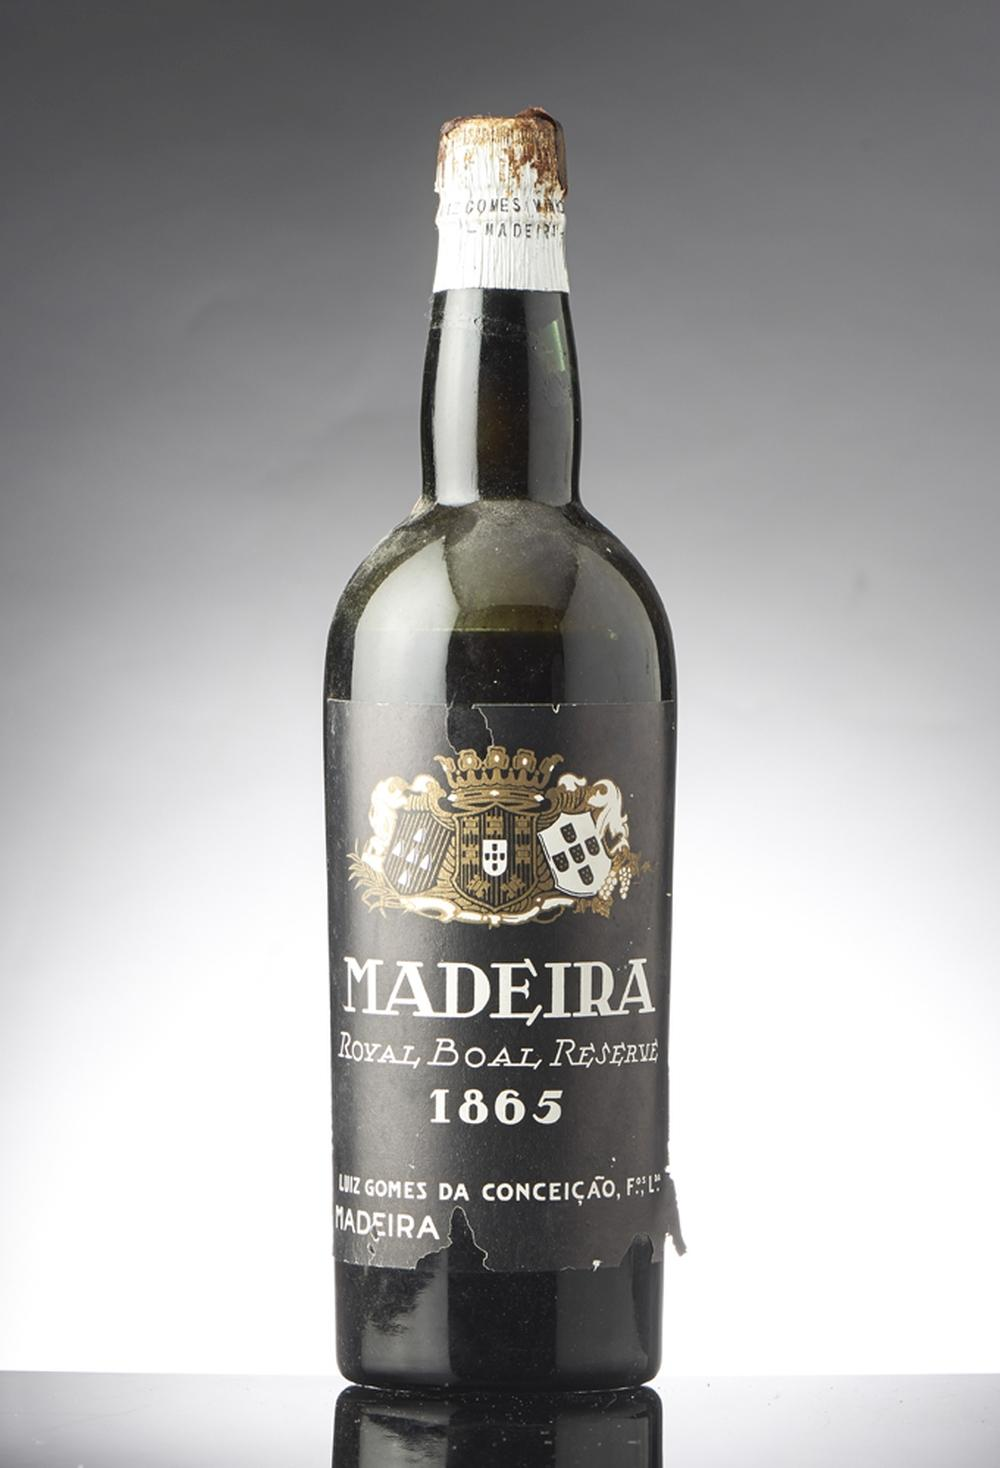 Madeira, Royal Boal Reserve, 1865, 1 gfa.